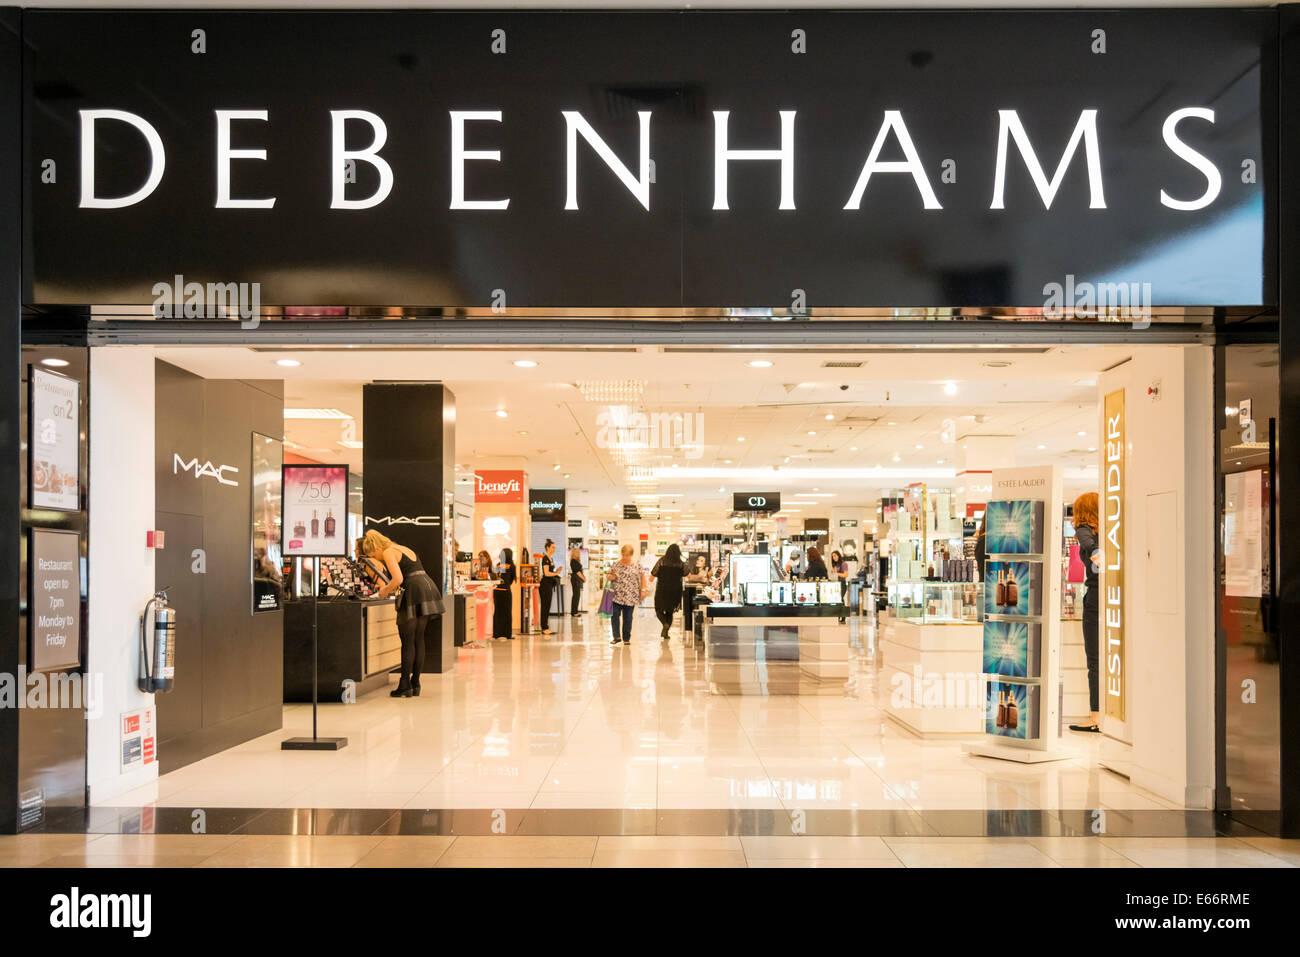 Tienda Debenhams, Reino Unido. Imagen De Stock